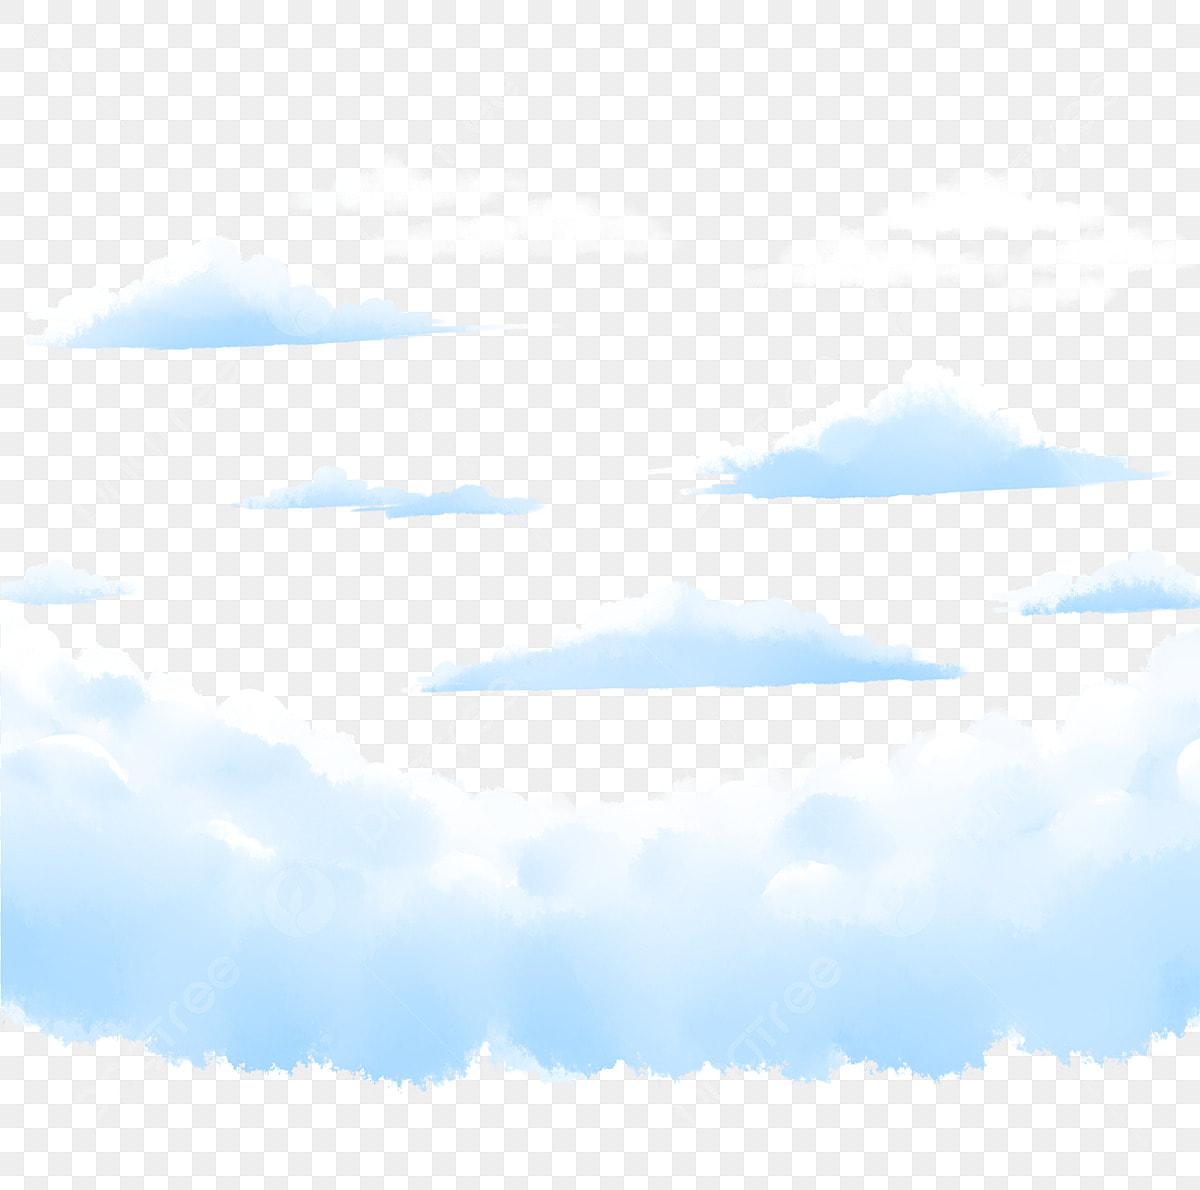 gambar langit biru awan putih awan awan langit biru awan putih awan png dan psd untuk muat turun percuma pngtree